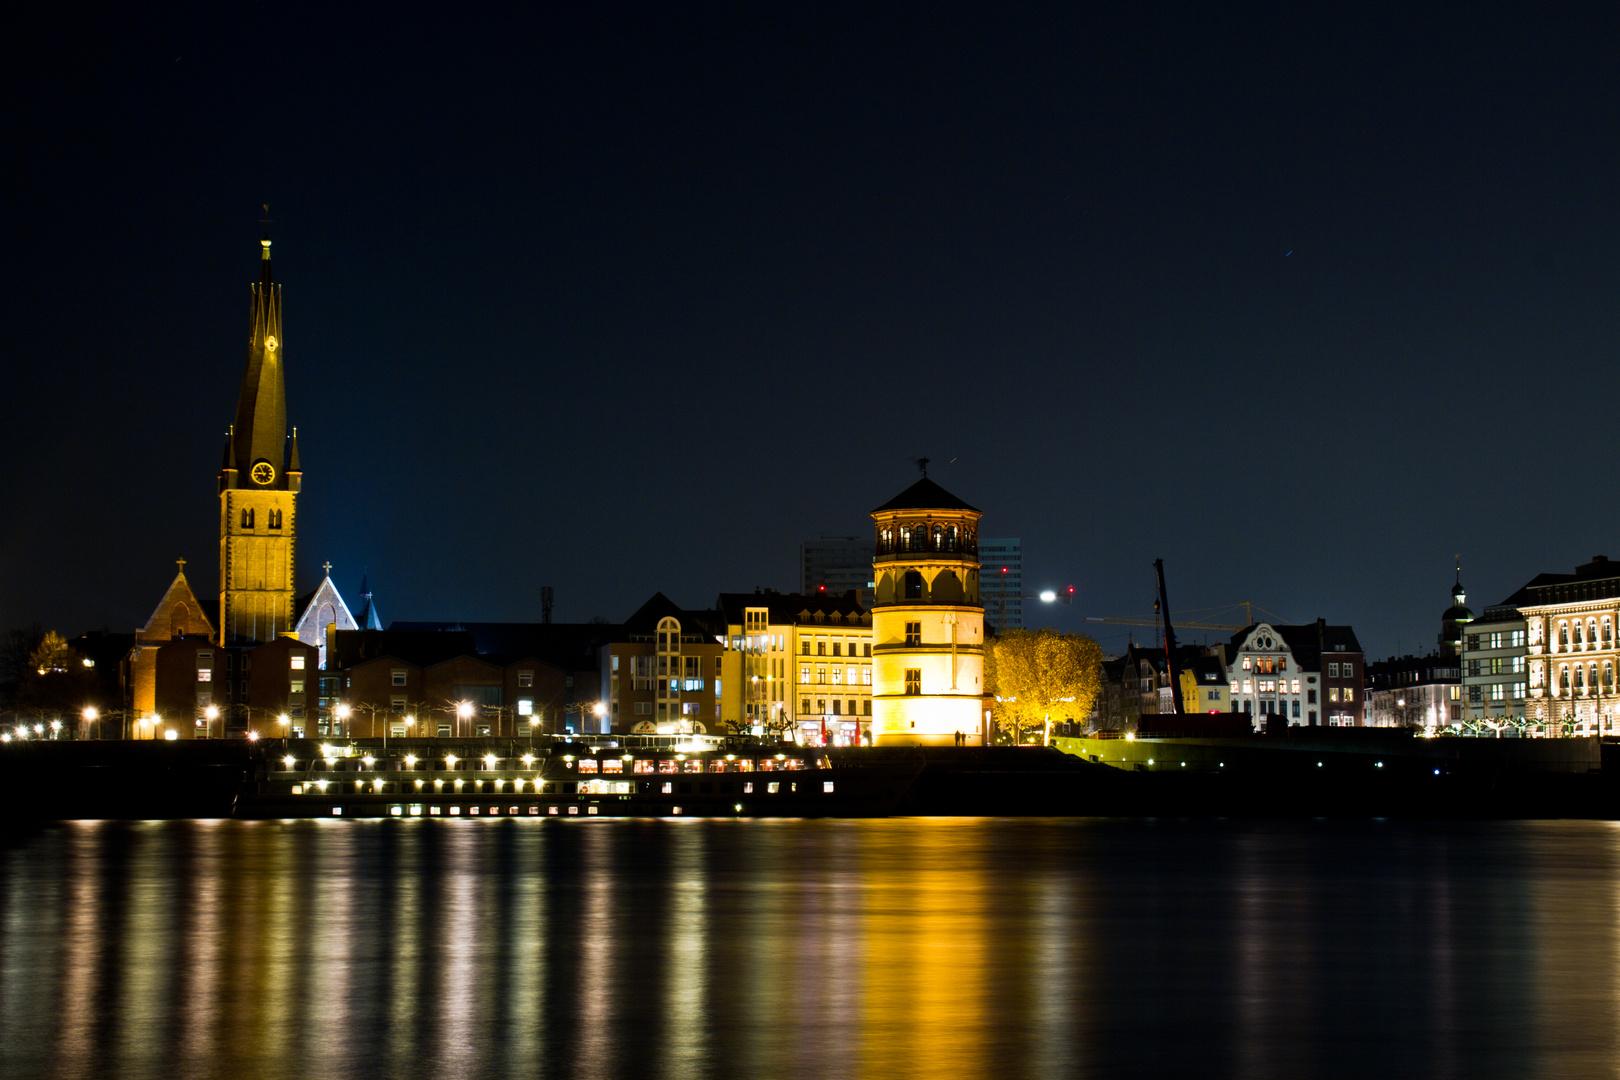 Düsseldorfer Altstadt bei Nacht